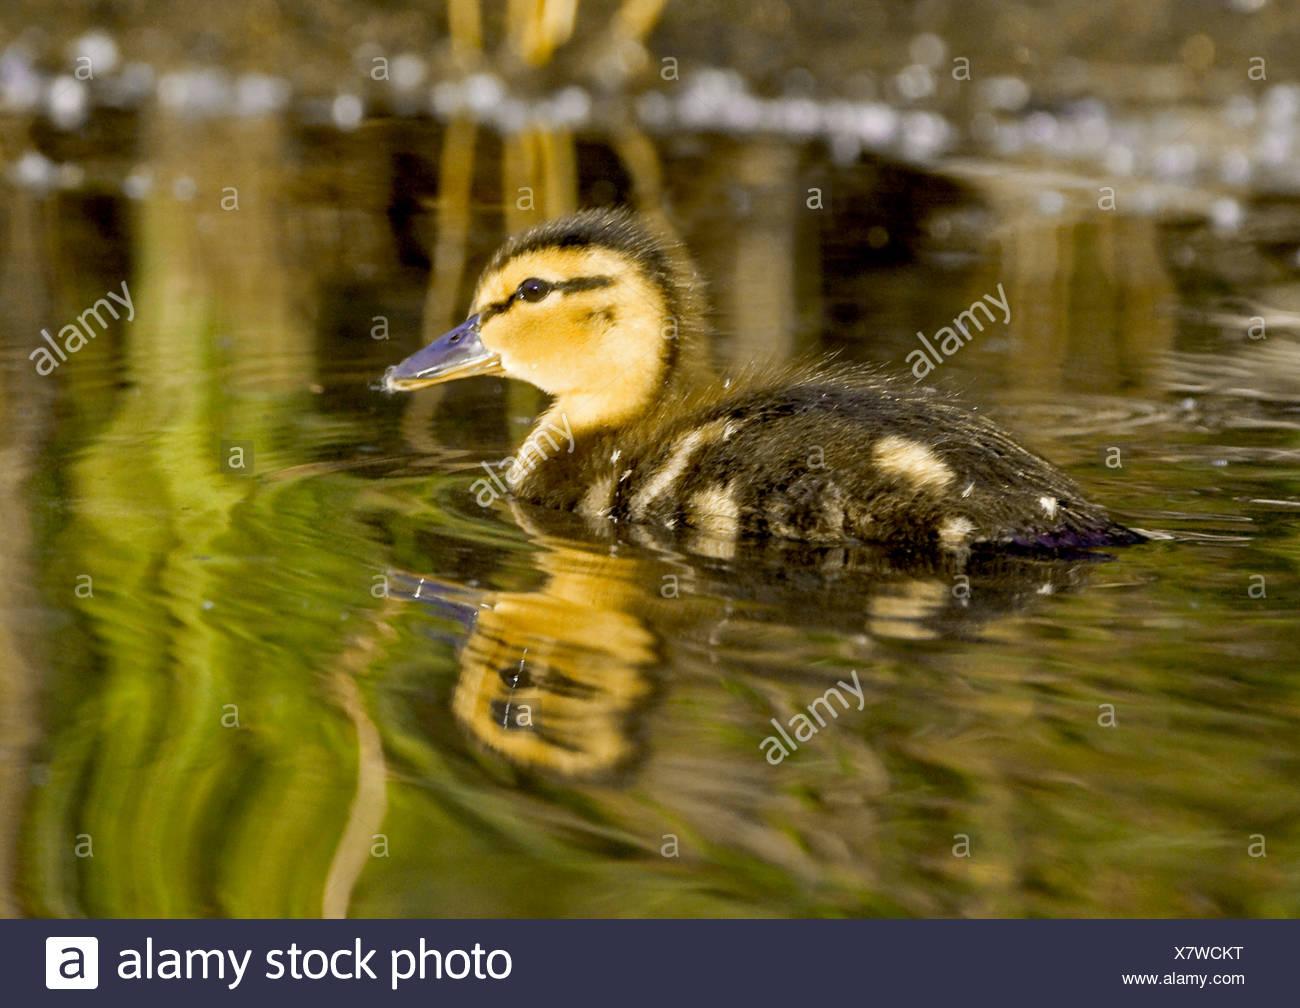 Alaska. Mallard (Anas platyrhynchos) duckling swimming in Cheney lake, Anchorage. - Stock Image